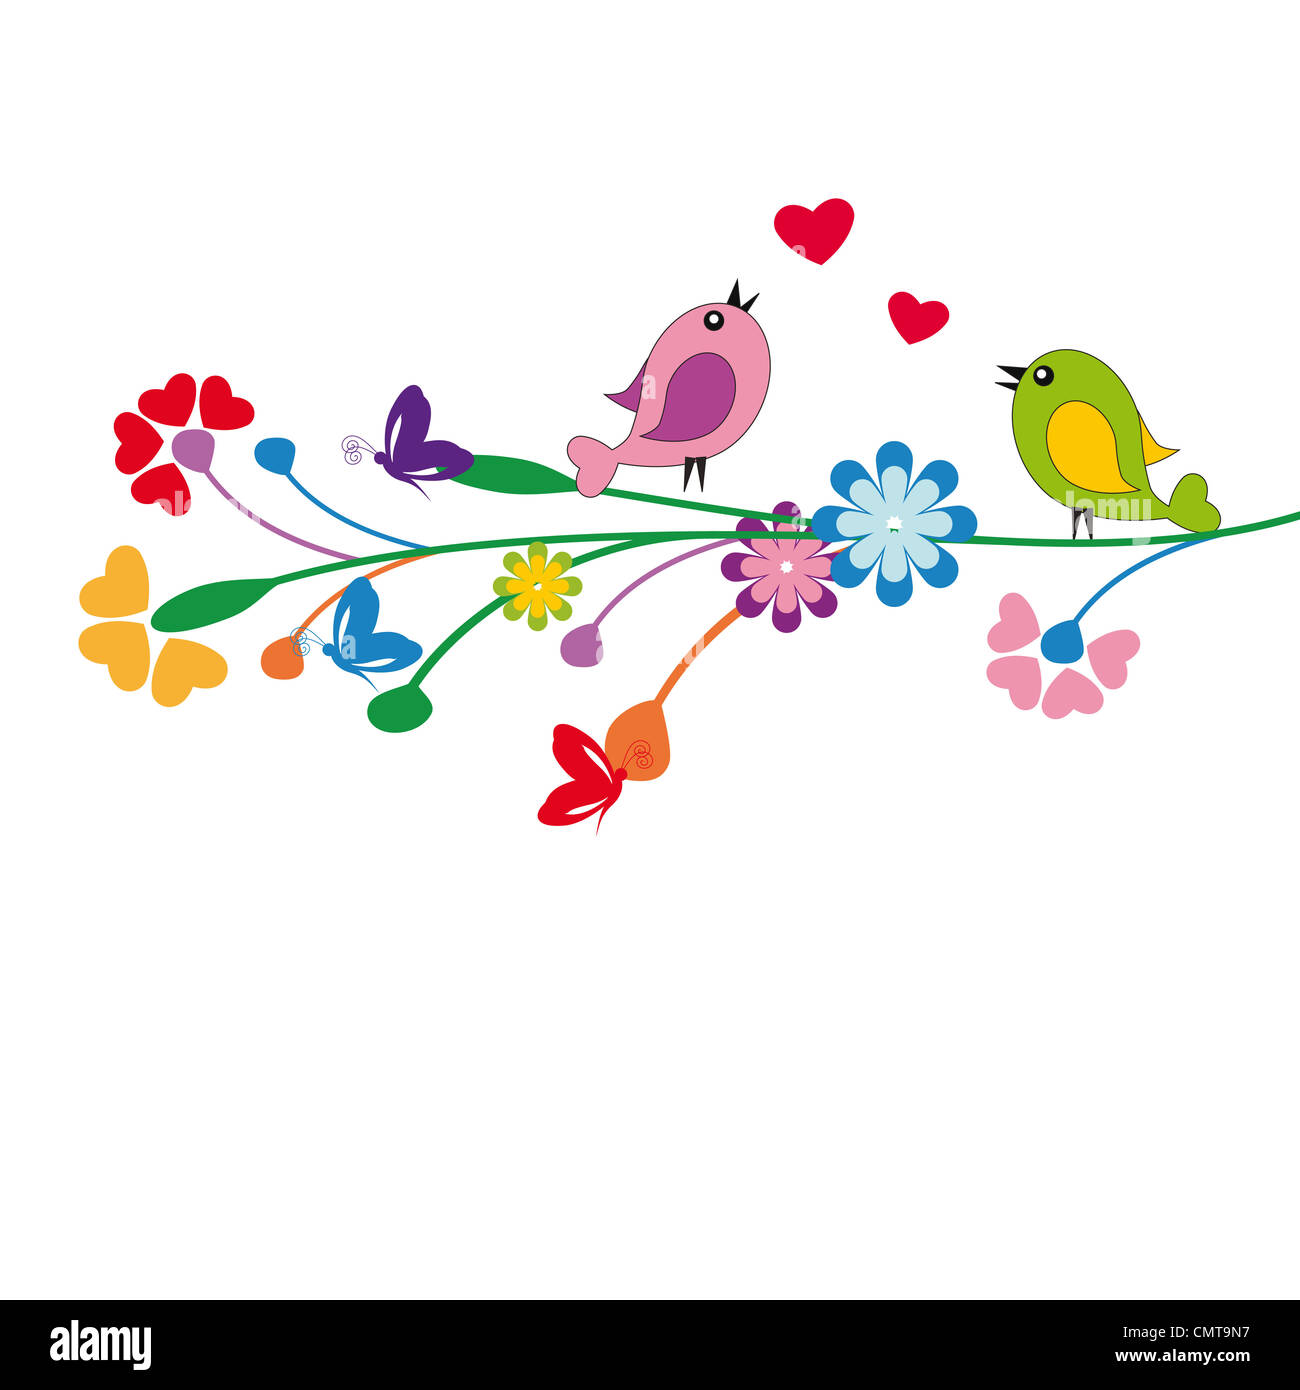 Cute kids cartoon avec fleurs et oiseaux Photo Stock